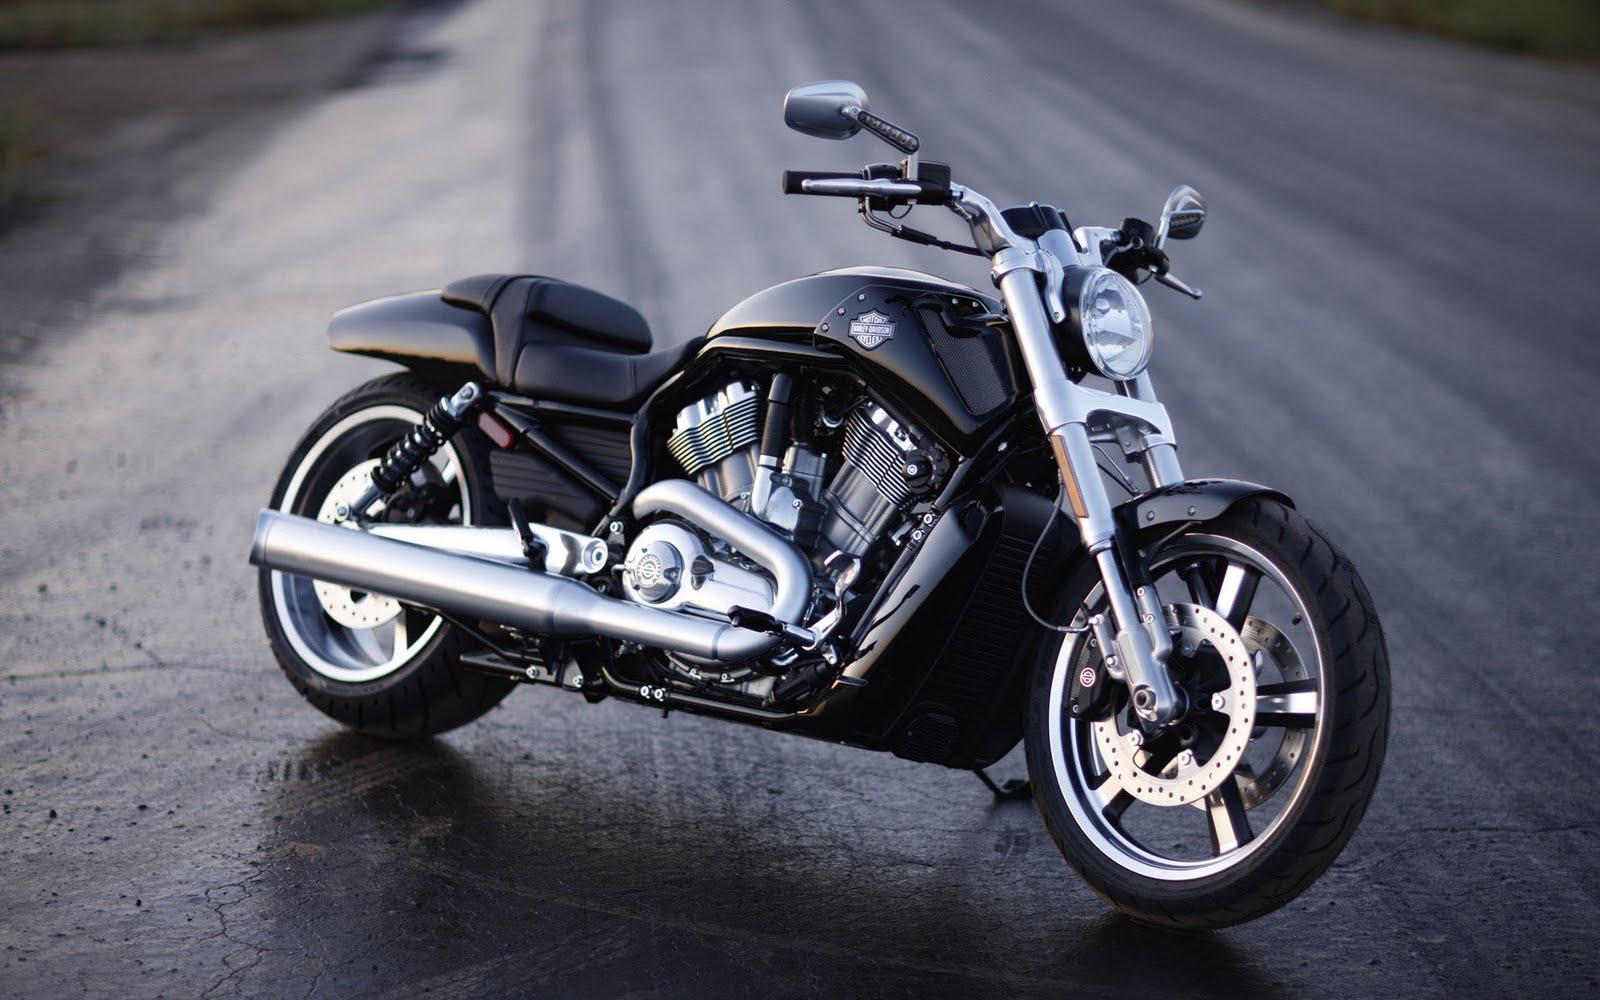 Harley Davidson Motorcycle HD Wallpapers Full HD Wallpapers 1600x1000